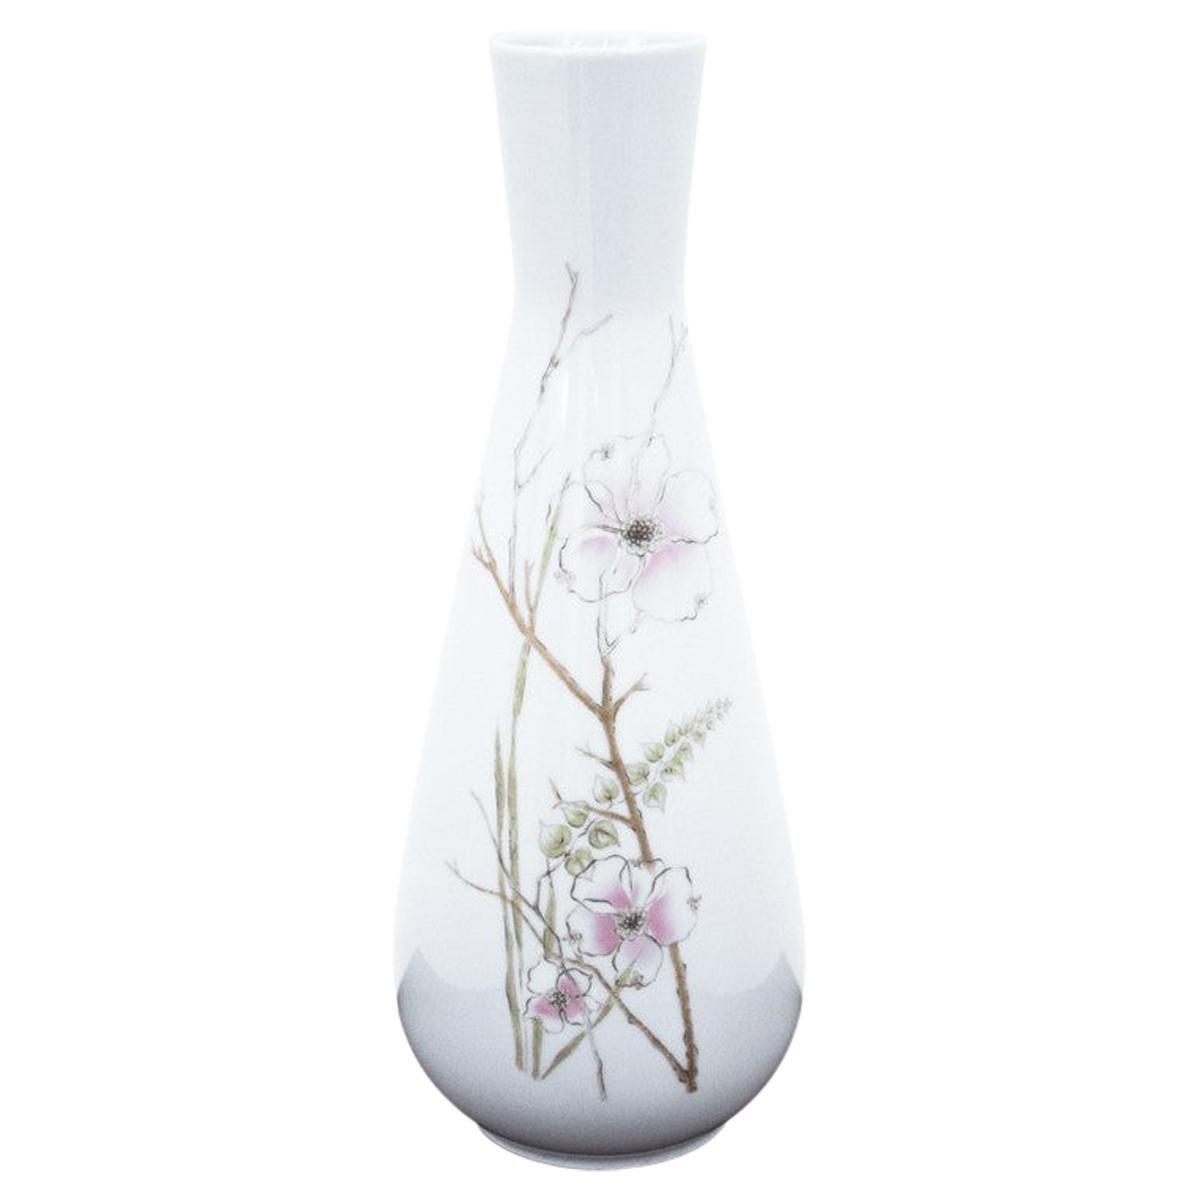 Porcelain Vase by Rosenthal, Germany, 1950s